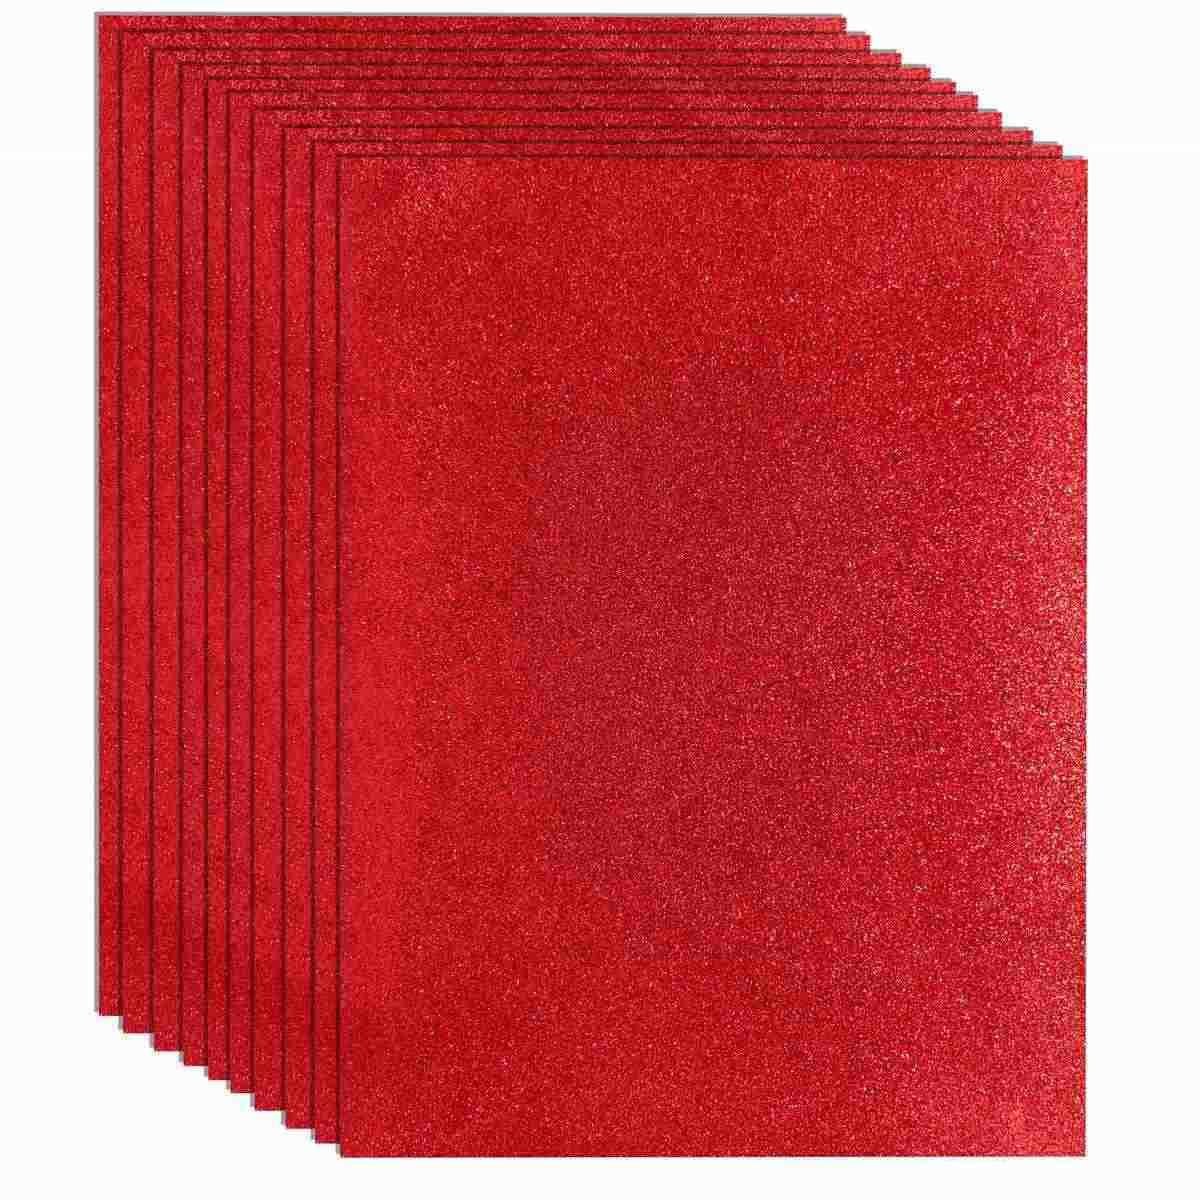 Glitter Foam A3 Sheet Without Sticker Red